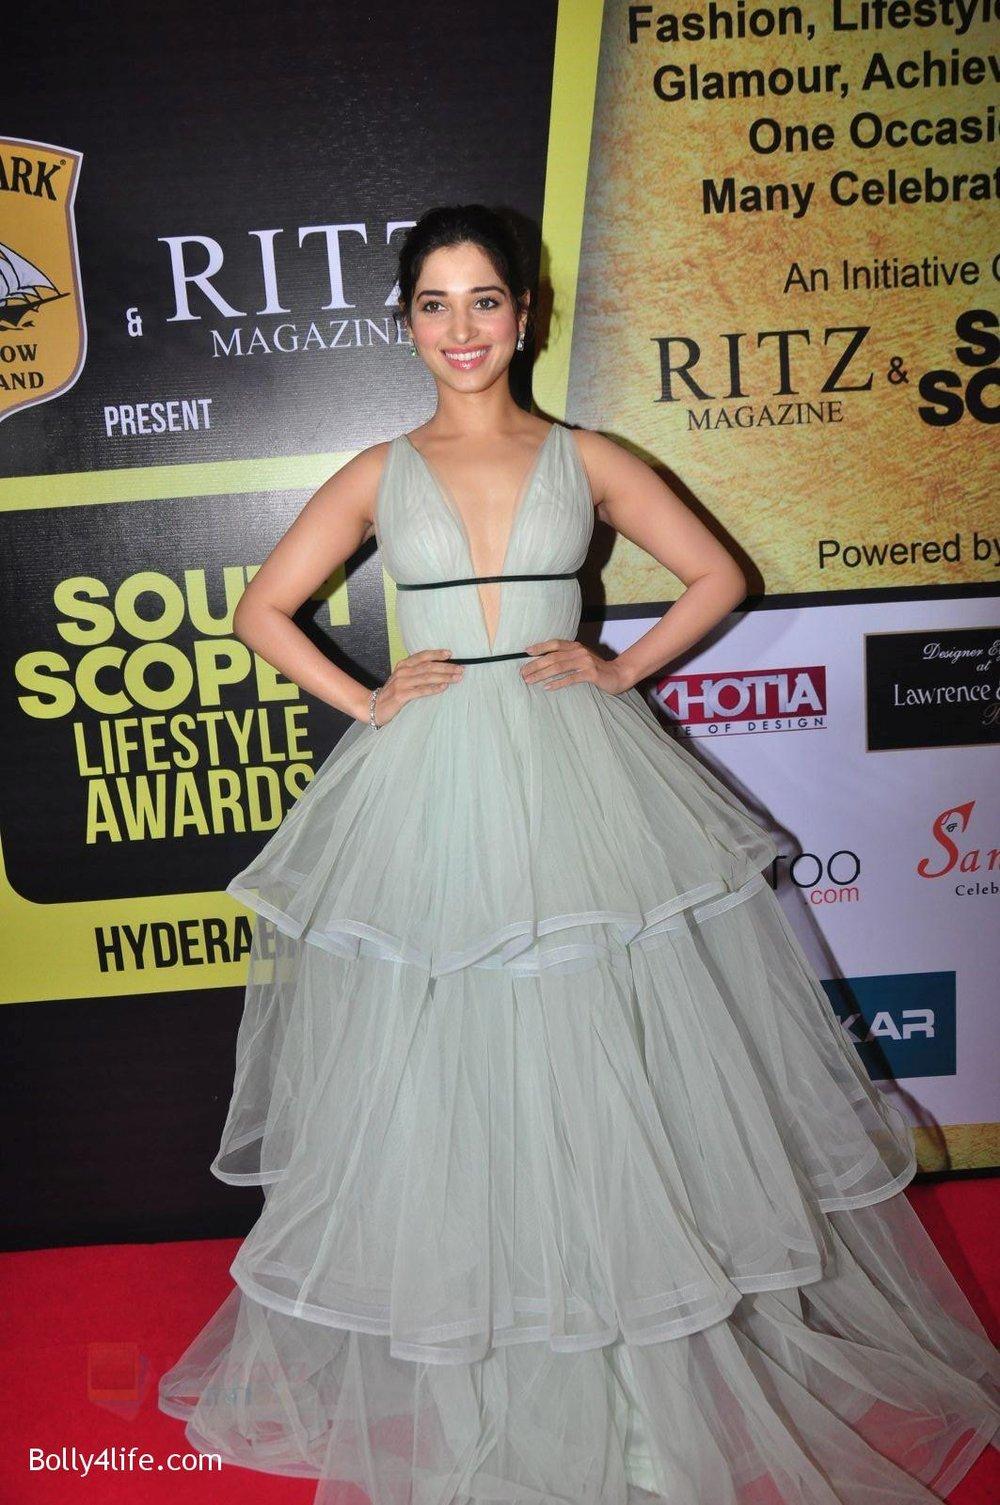 Tamannah-Bhatia-at-South-Scope-Lifestyle-Awards-9.jpg